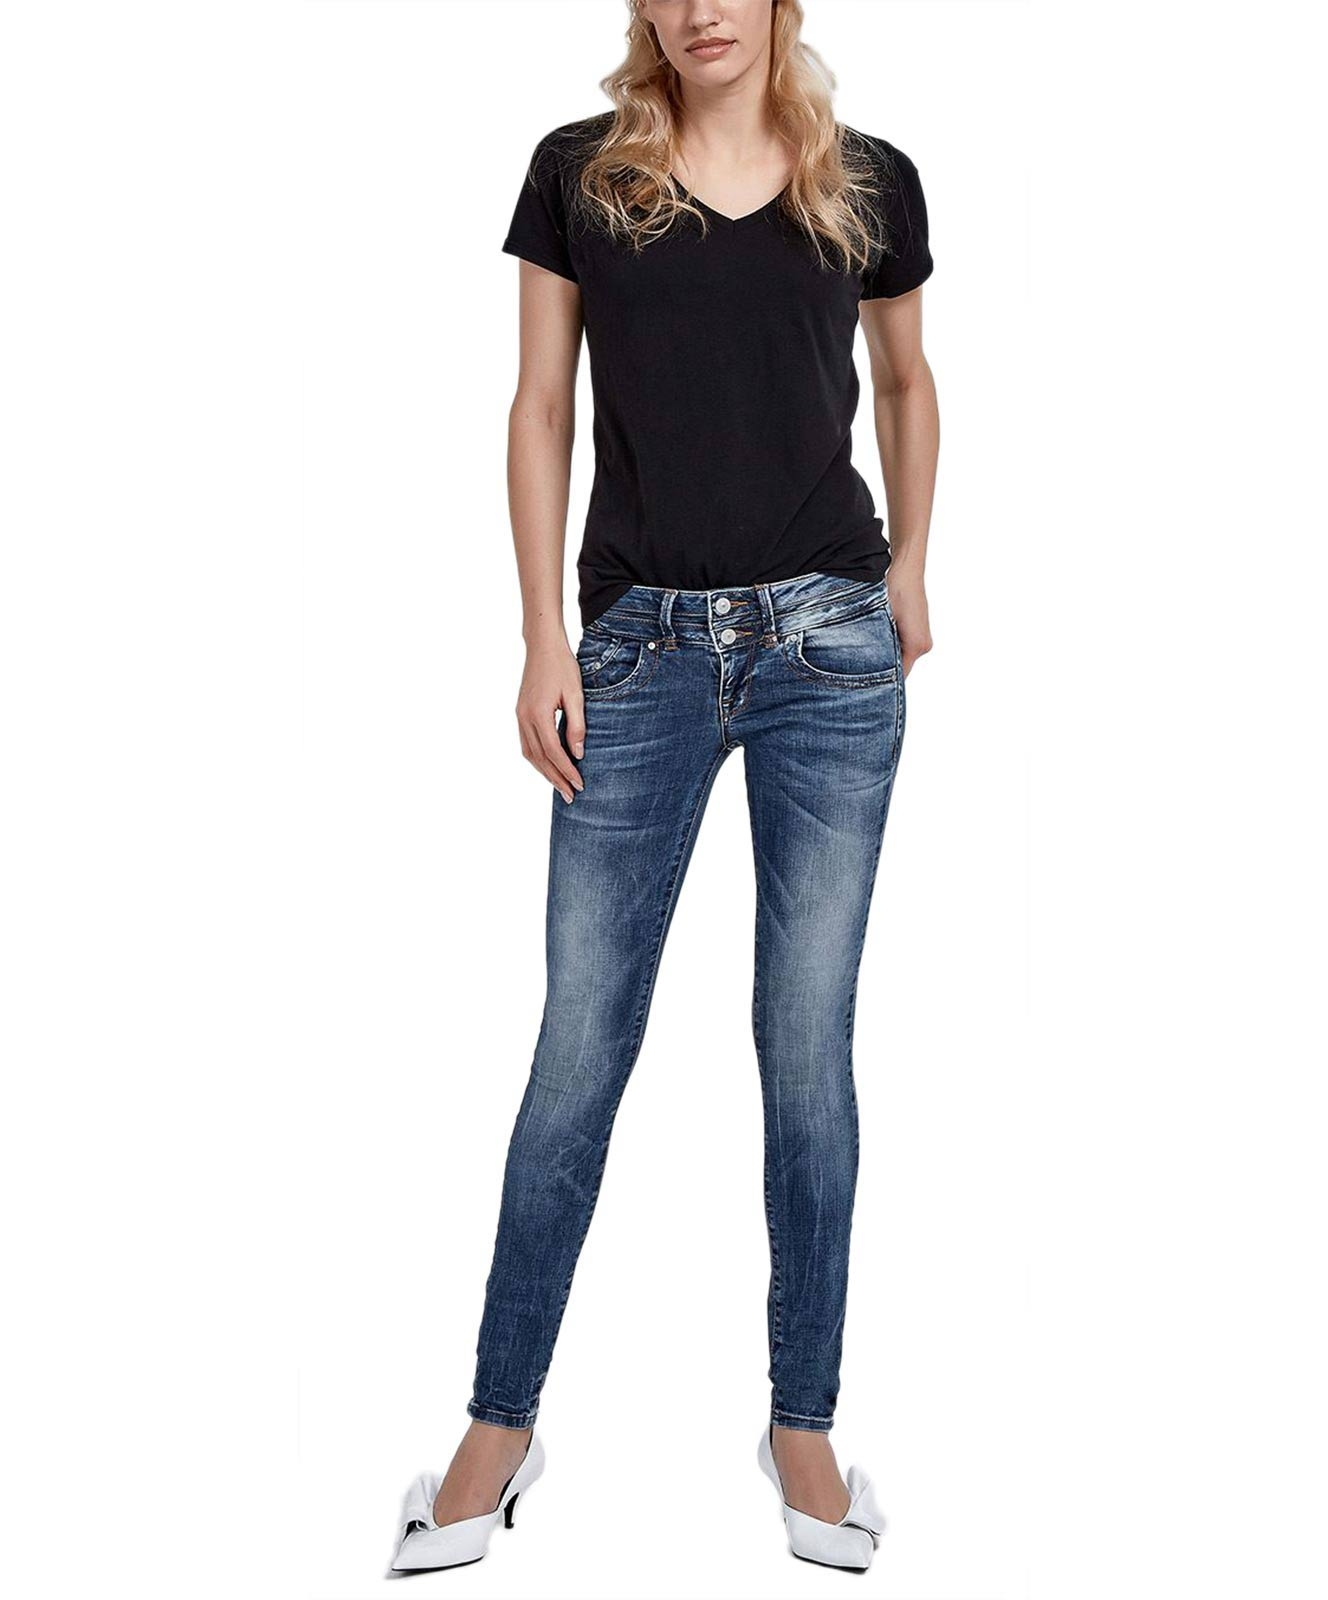 Hosen - LTB Skinny Jeans Julita X in Angellis Wash  - Onlineshop Jeans Meile